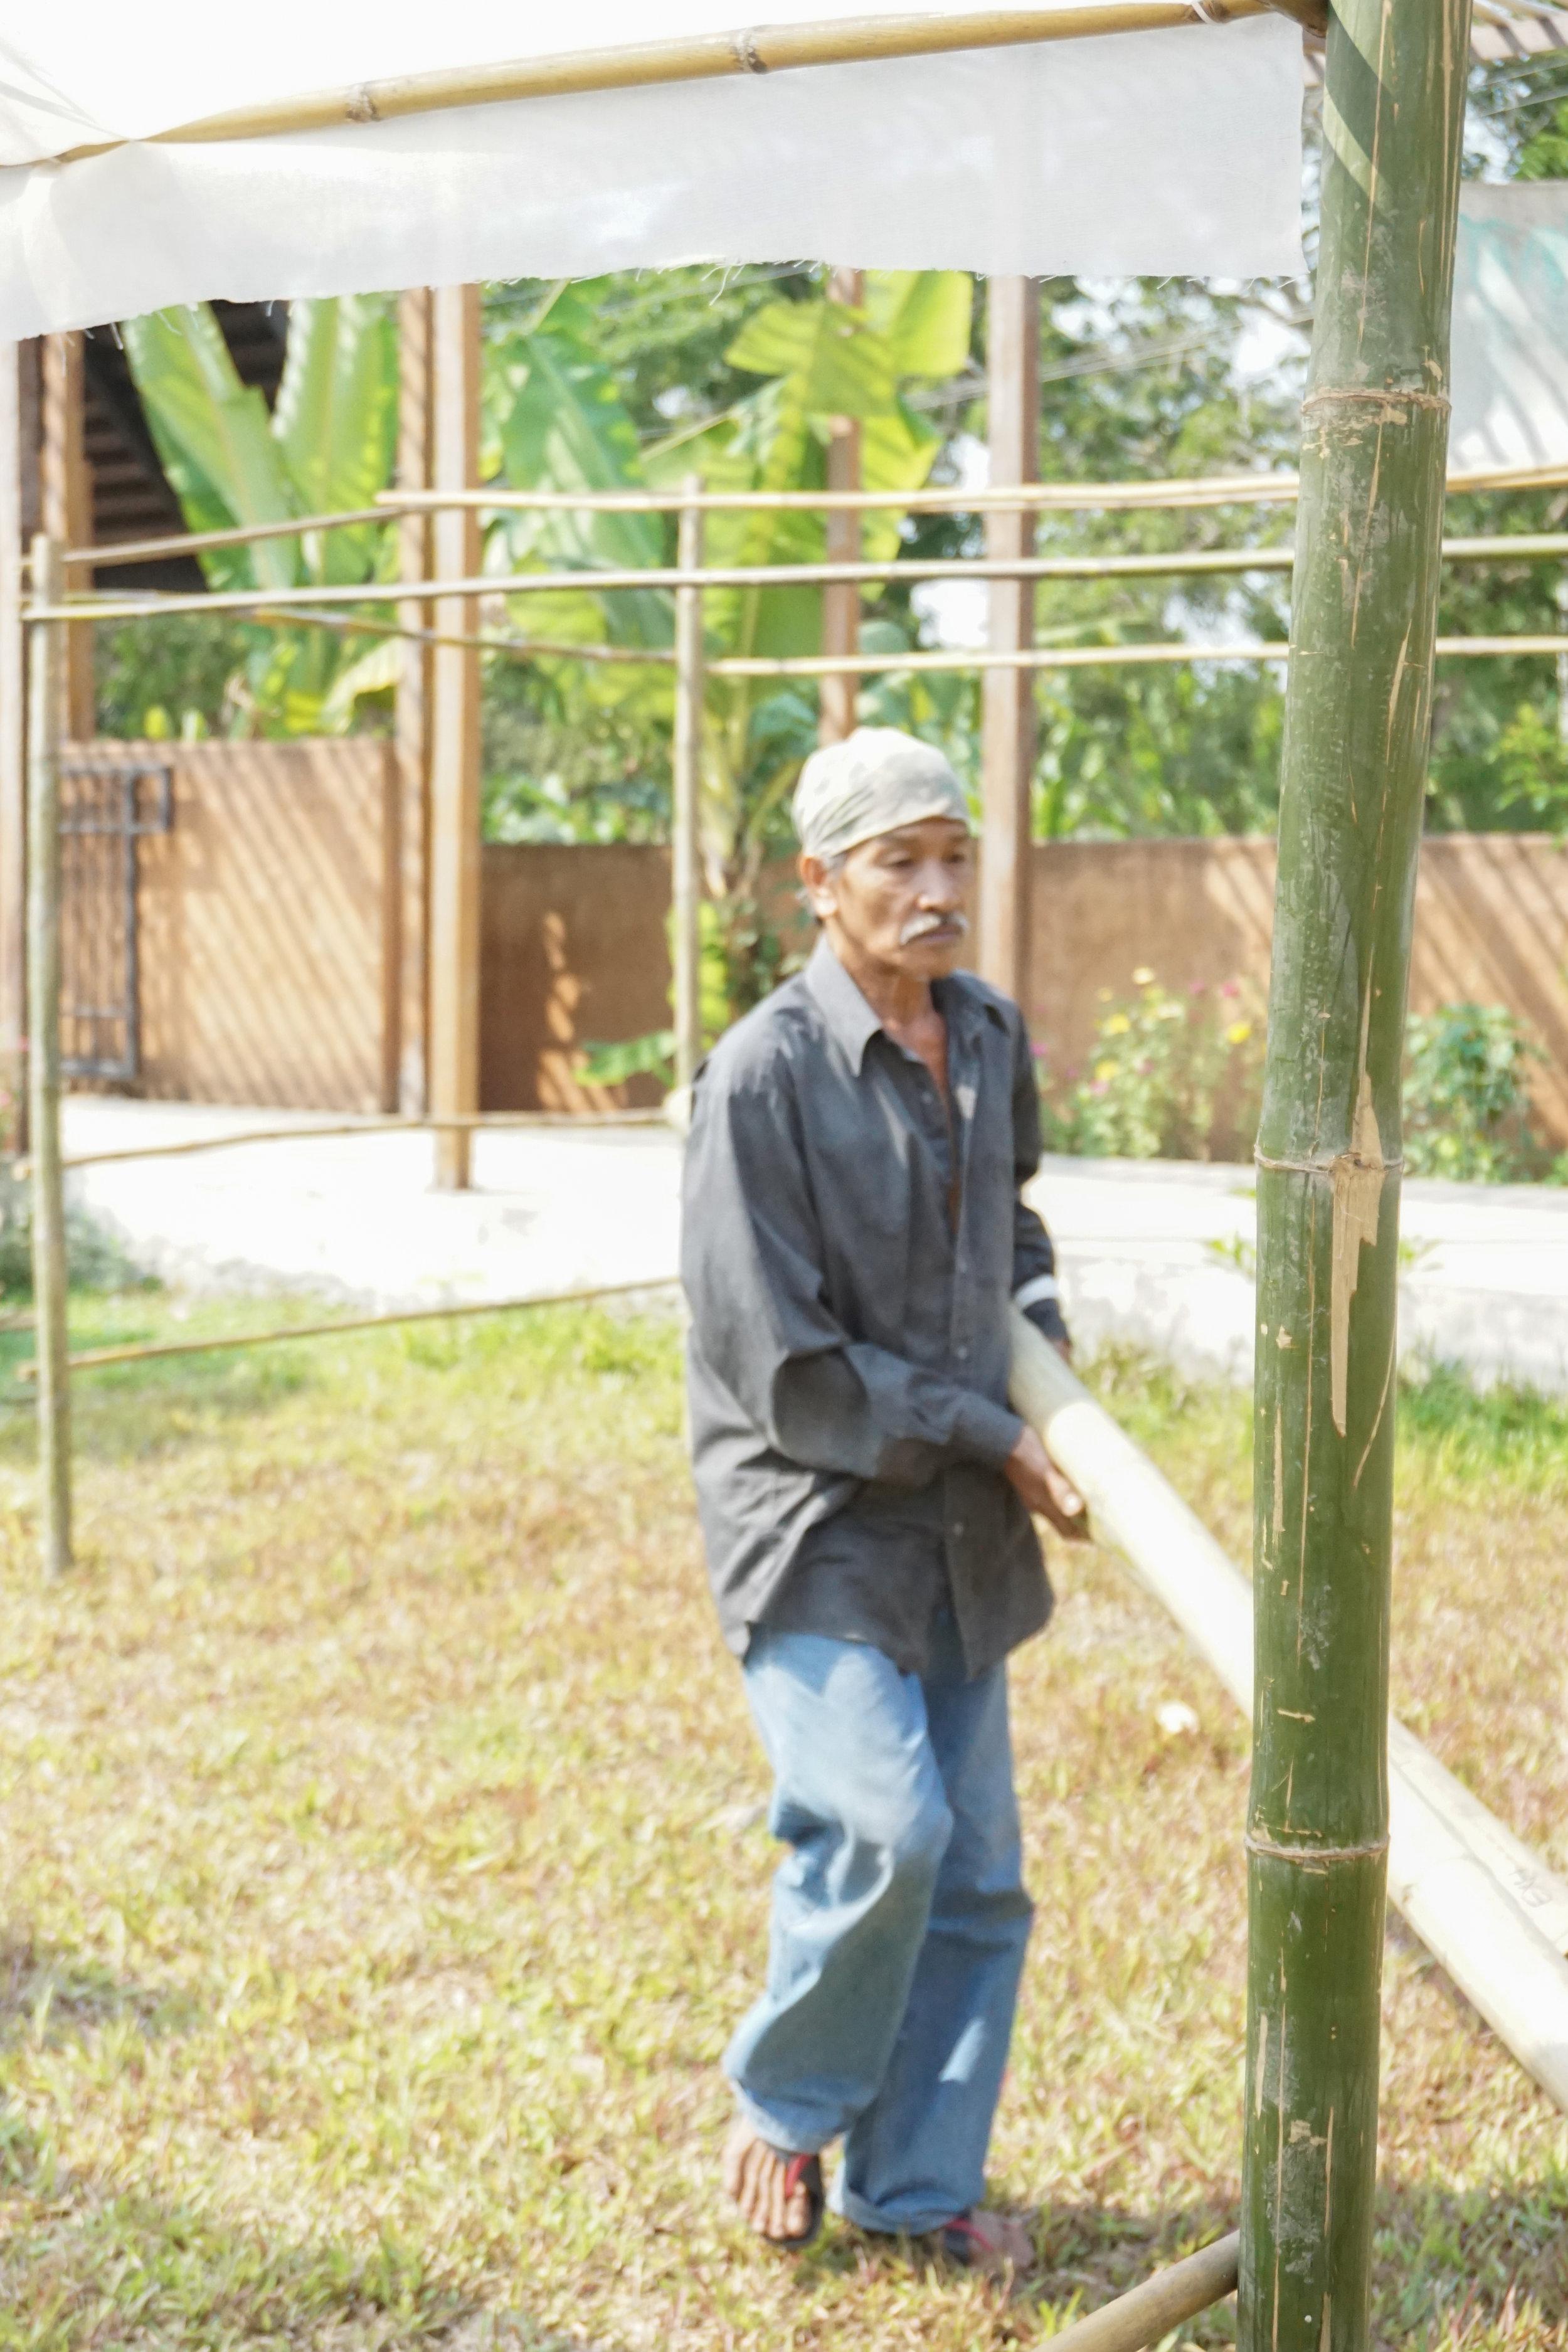 Building Thai City Farm Festival using natural materials